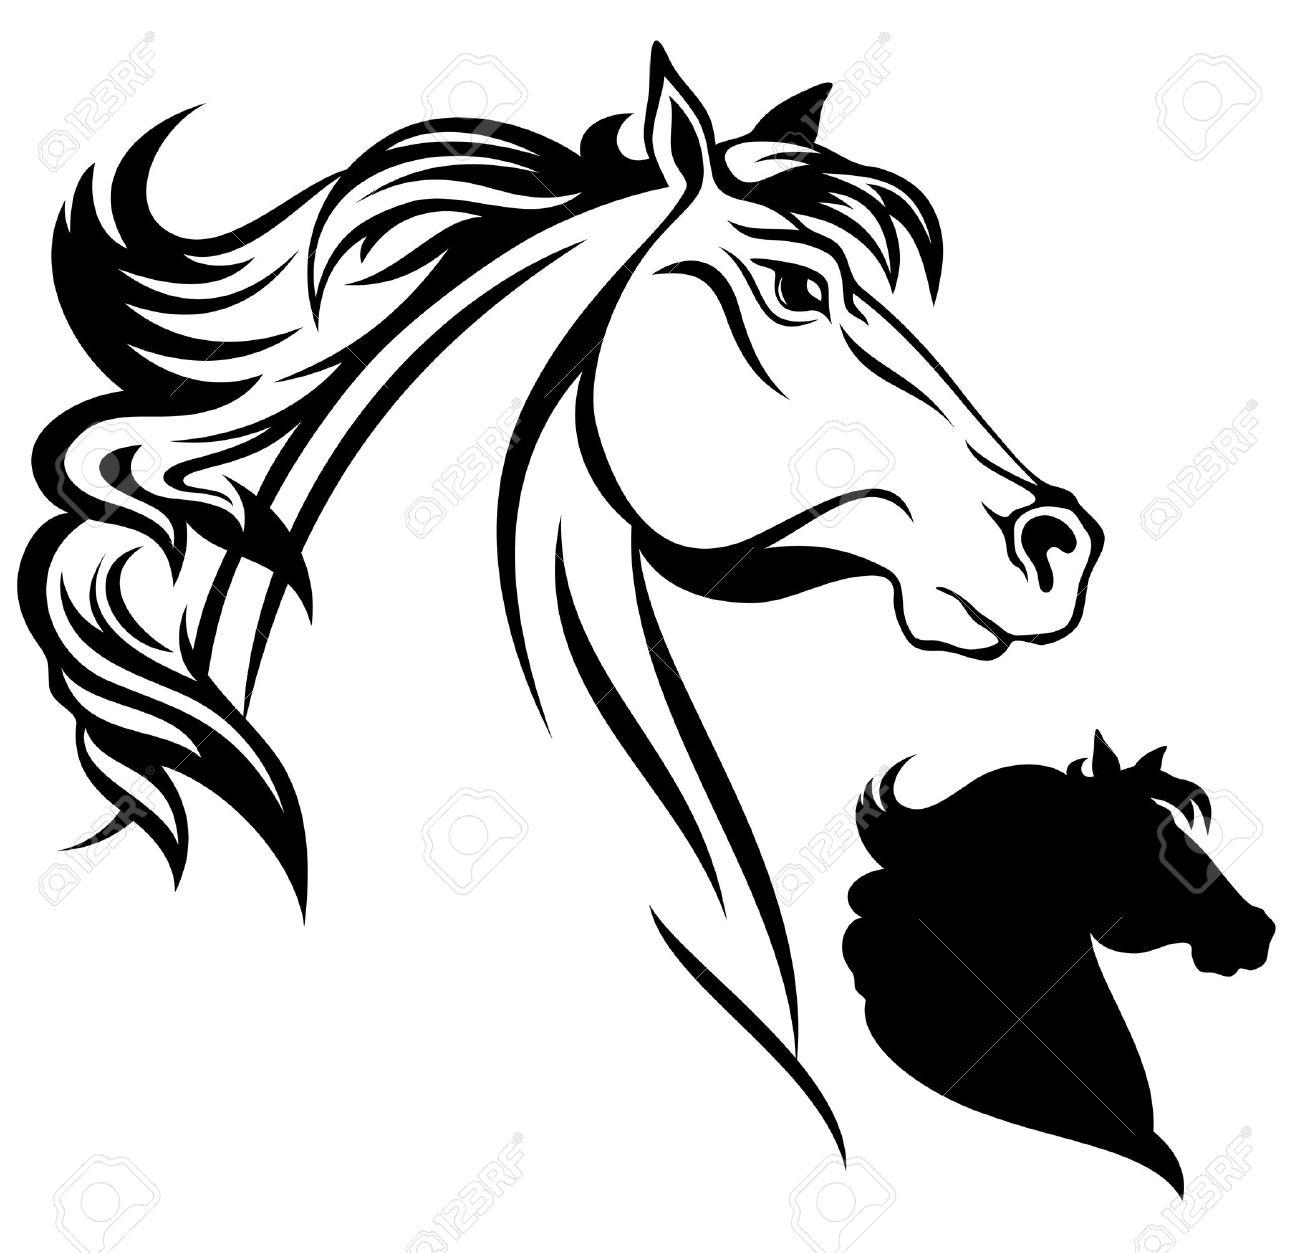 horse head vector royalty free cliparts vectors and stock rh 123rf com horse head vector art horse head vector free